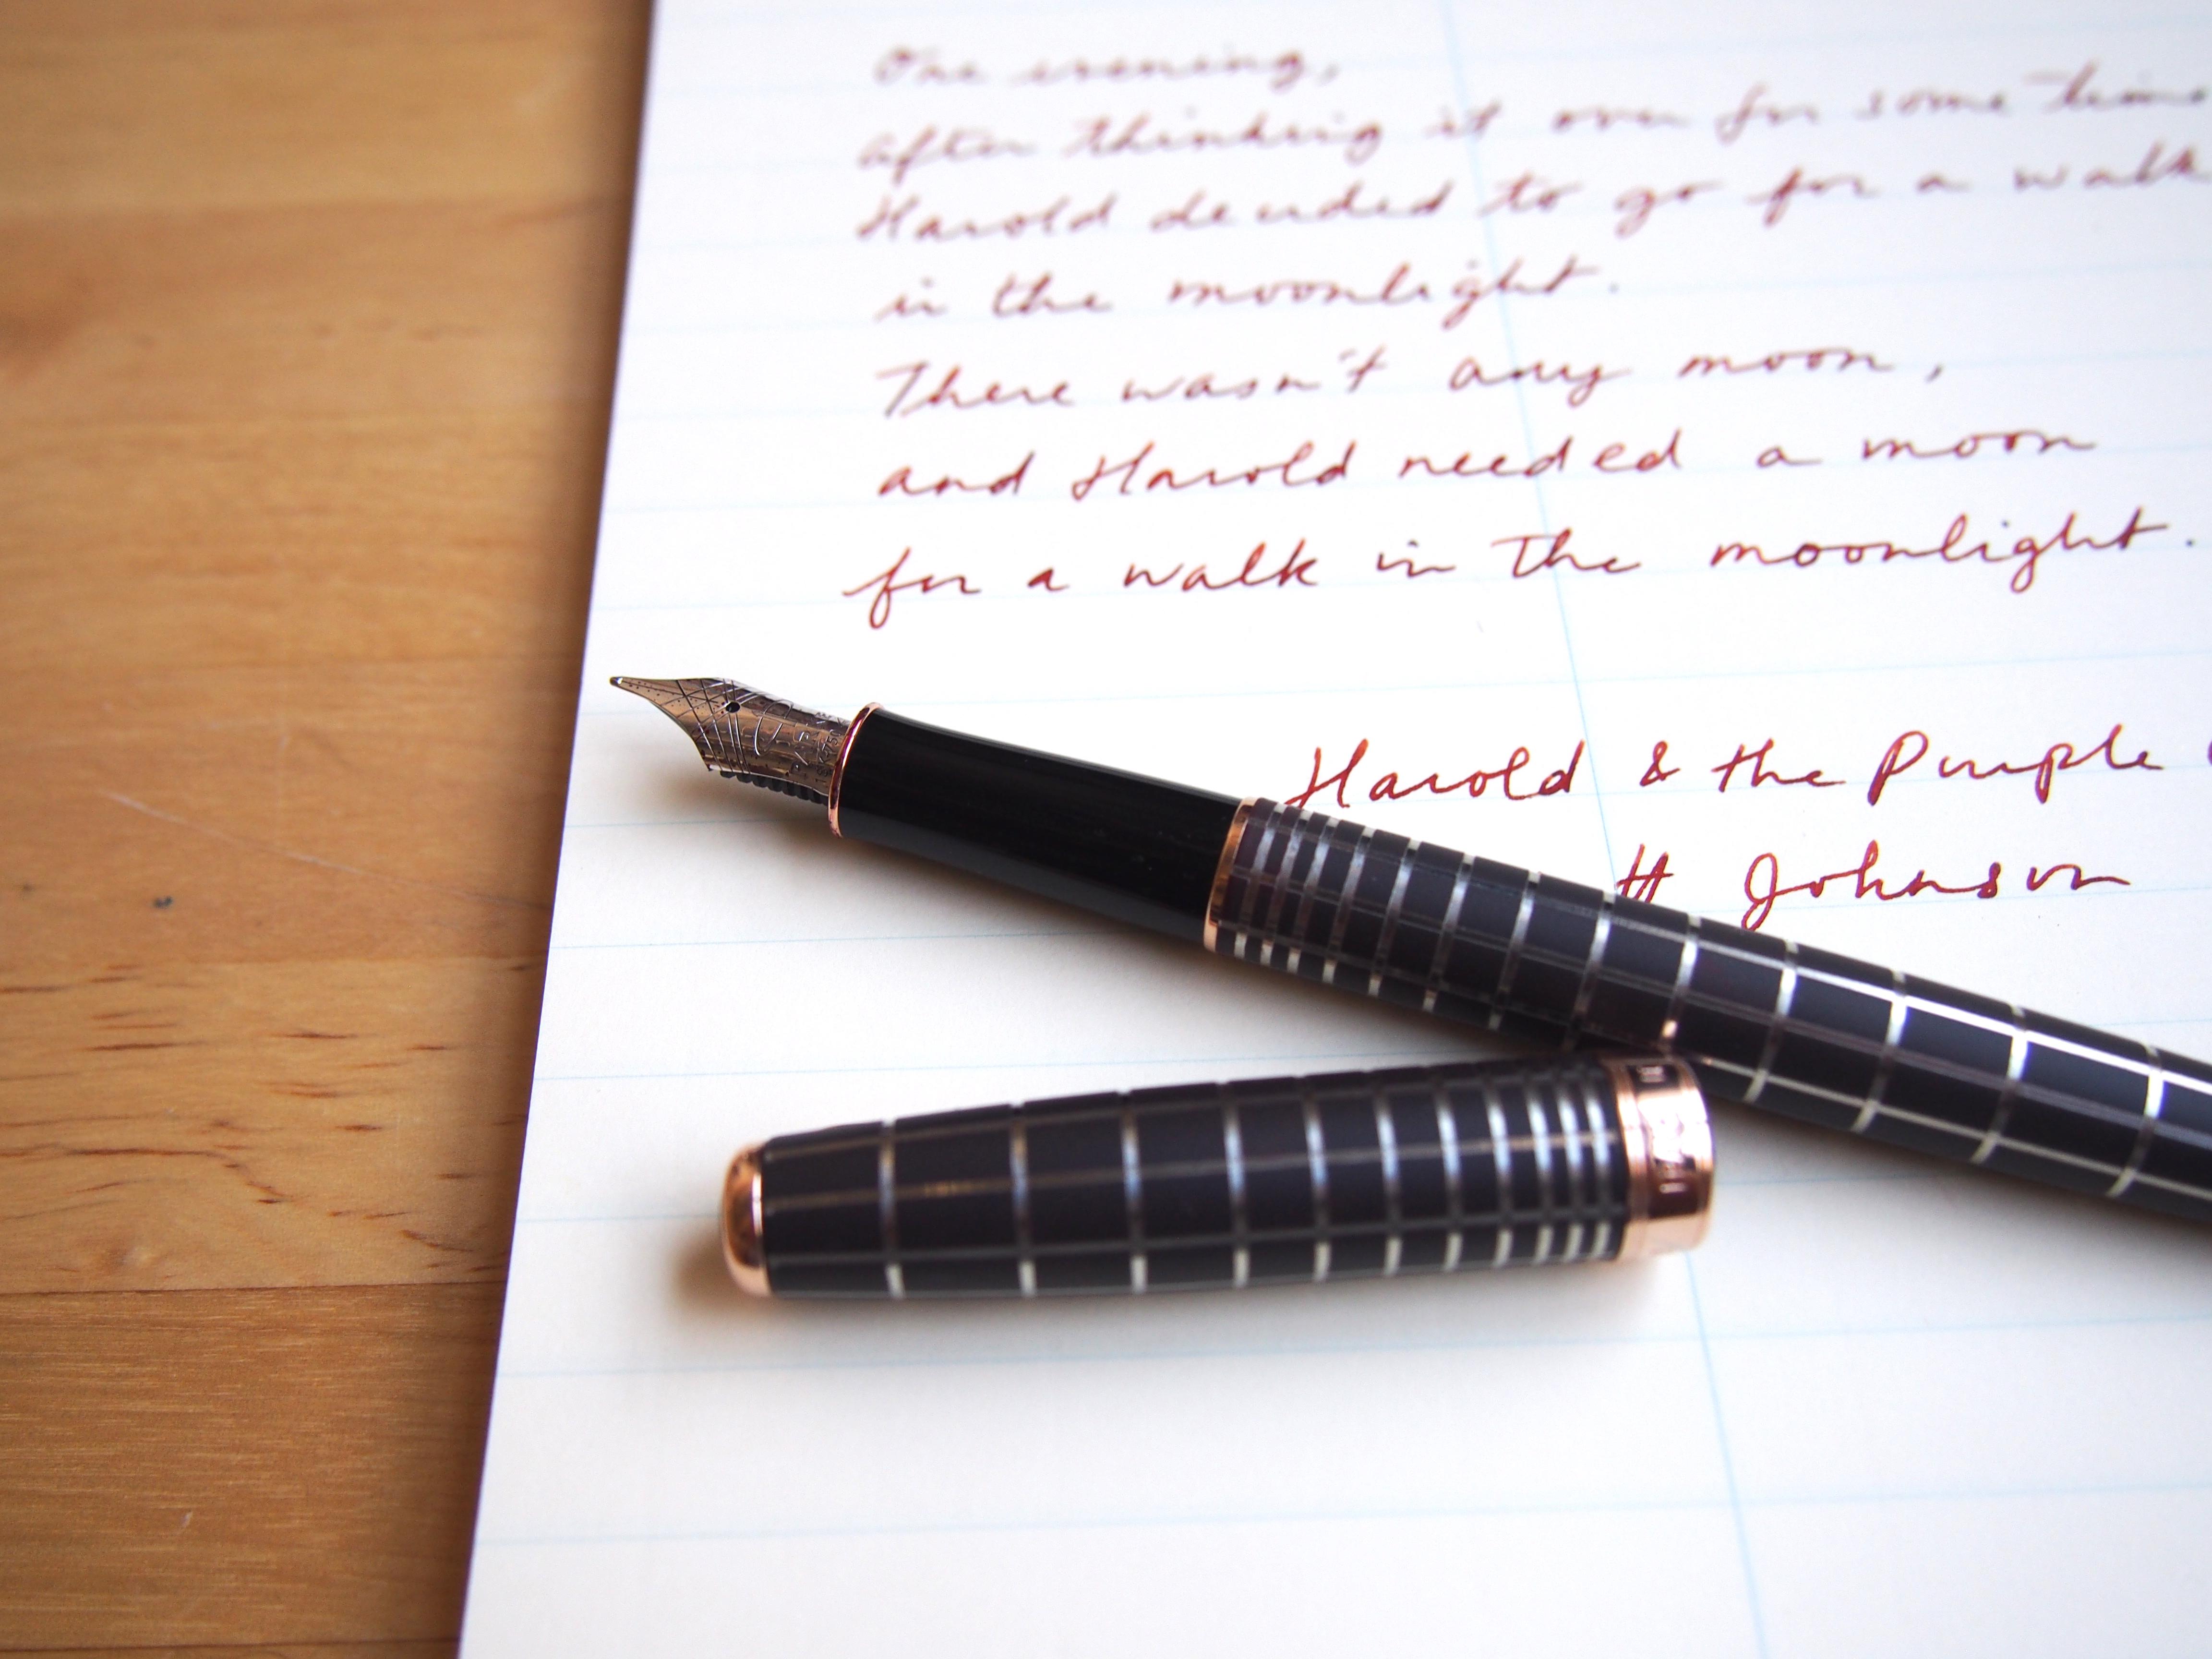 Parker Sonnet Fountain Pen Wonder Pens Blog wonderpens.ca Toronto Canada